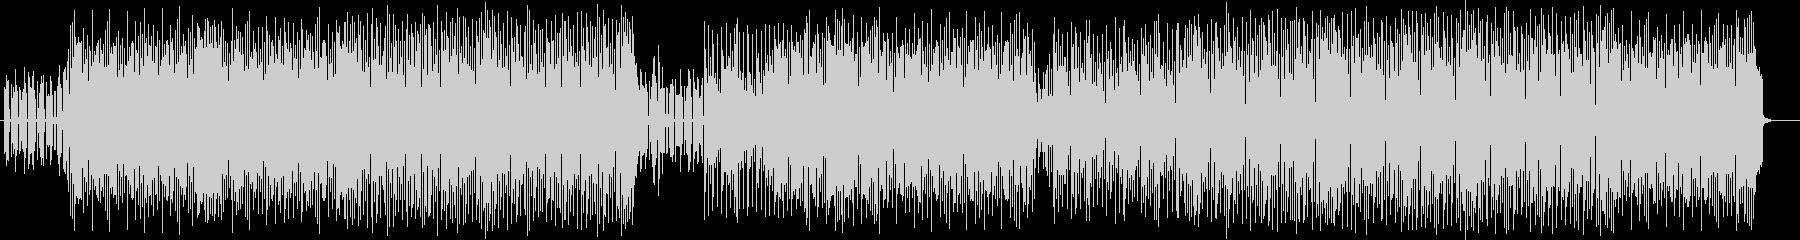 Light and near-future techno pops's unreproduced waveform